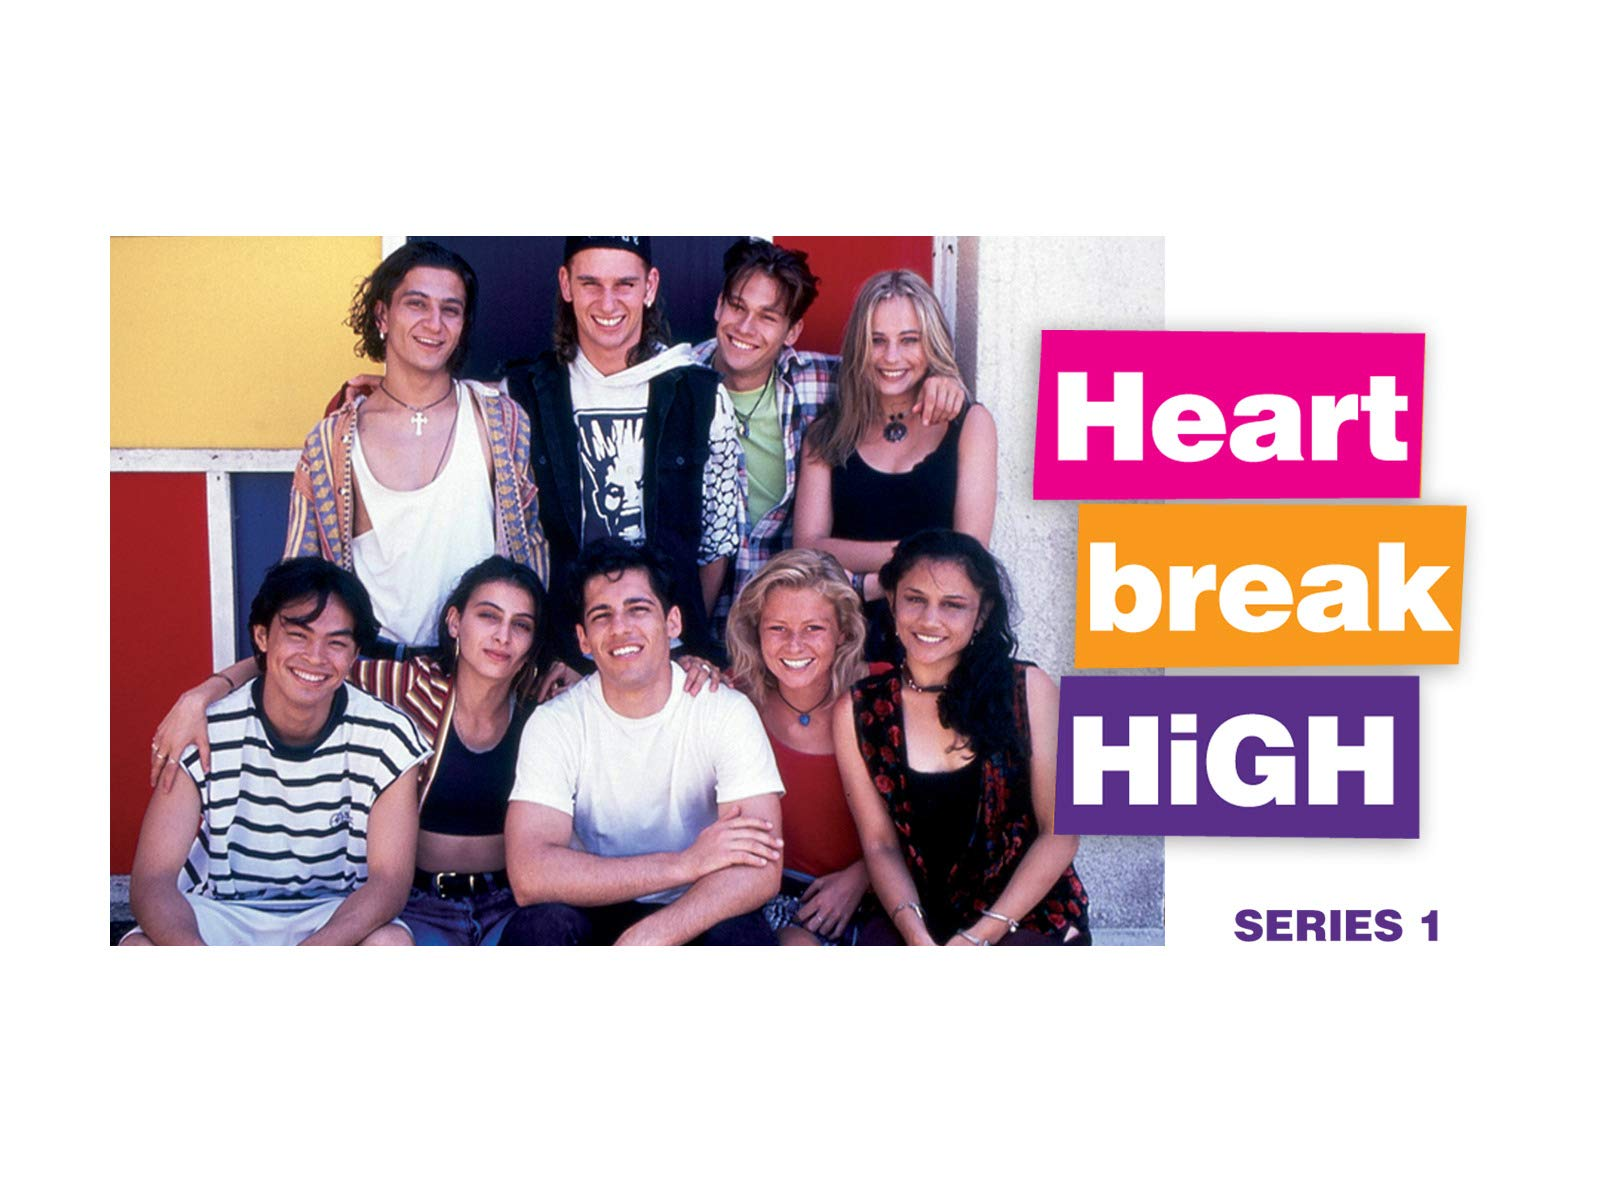 Amazoncouk Watch Heartbreak High Prime Video